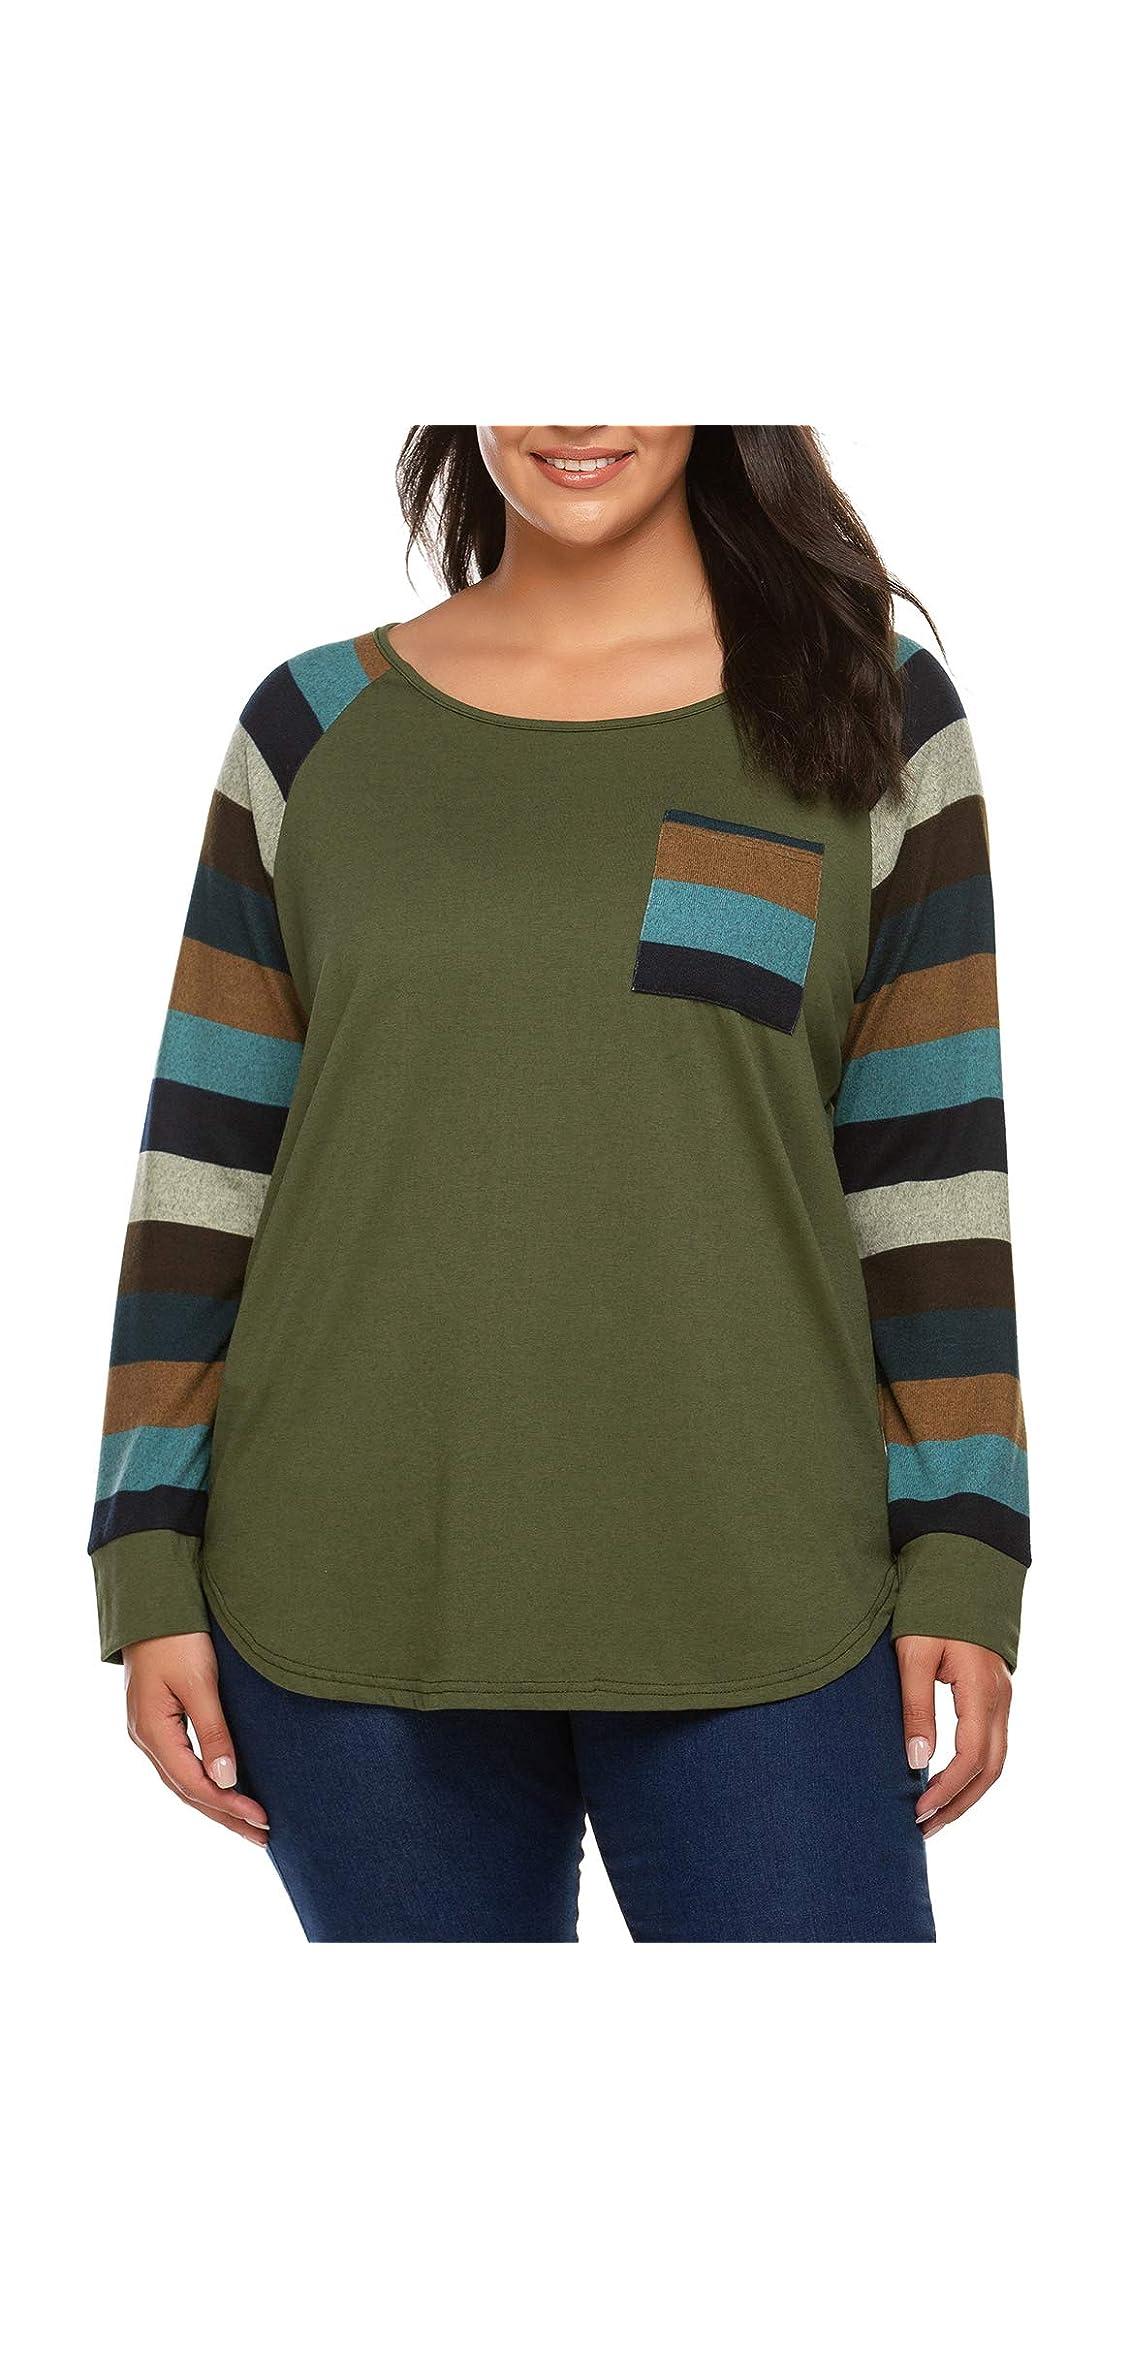 Women Plus Size Shirt Stripes Crew Neck Tee Long Tunic